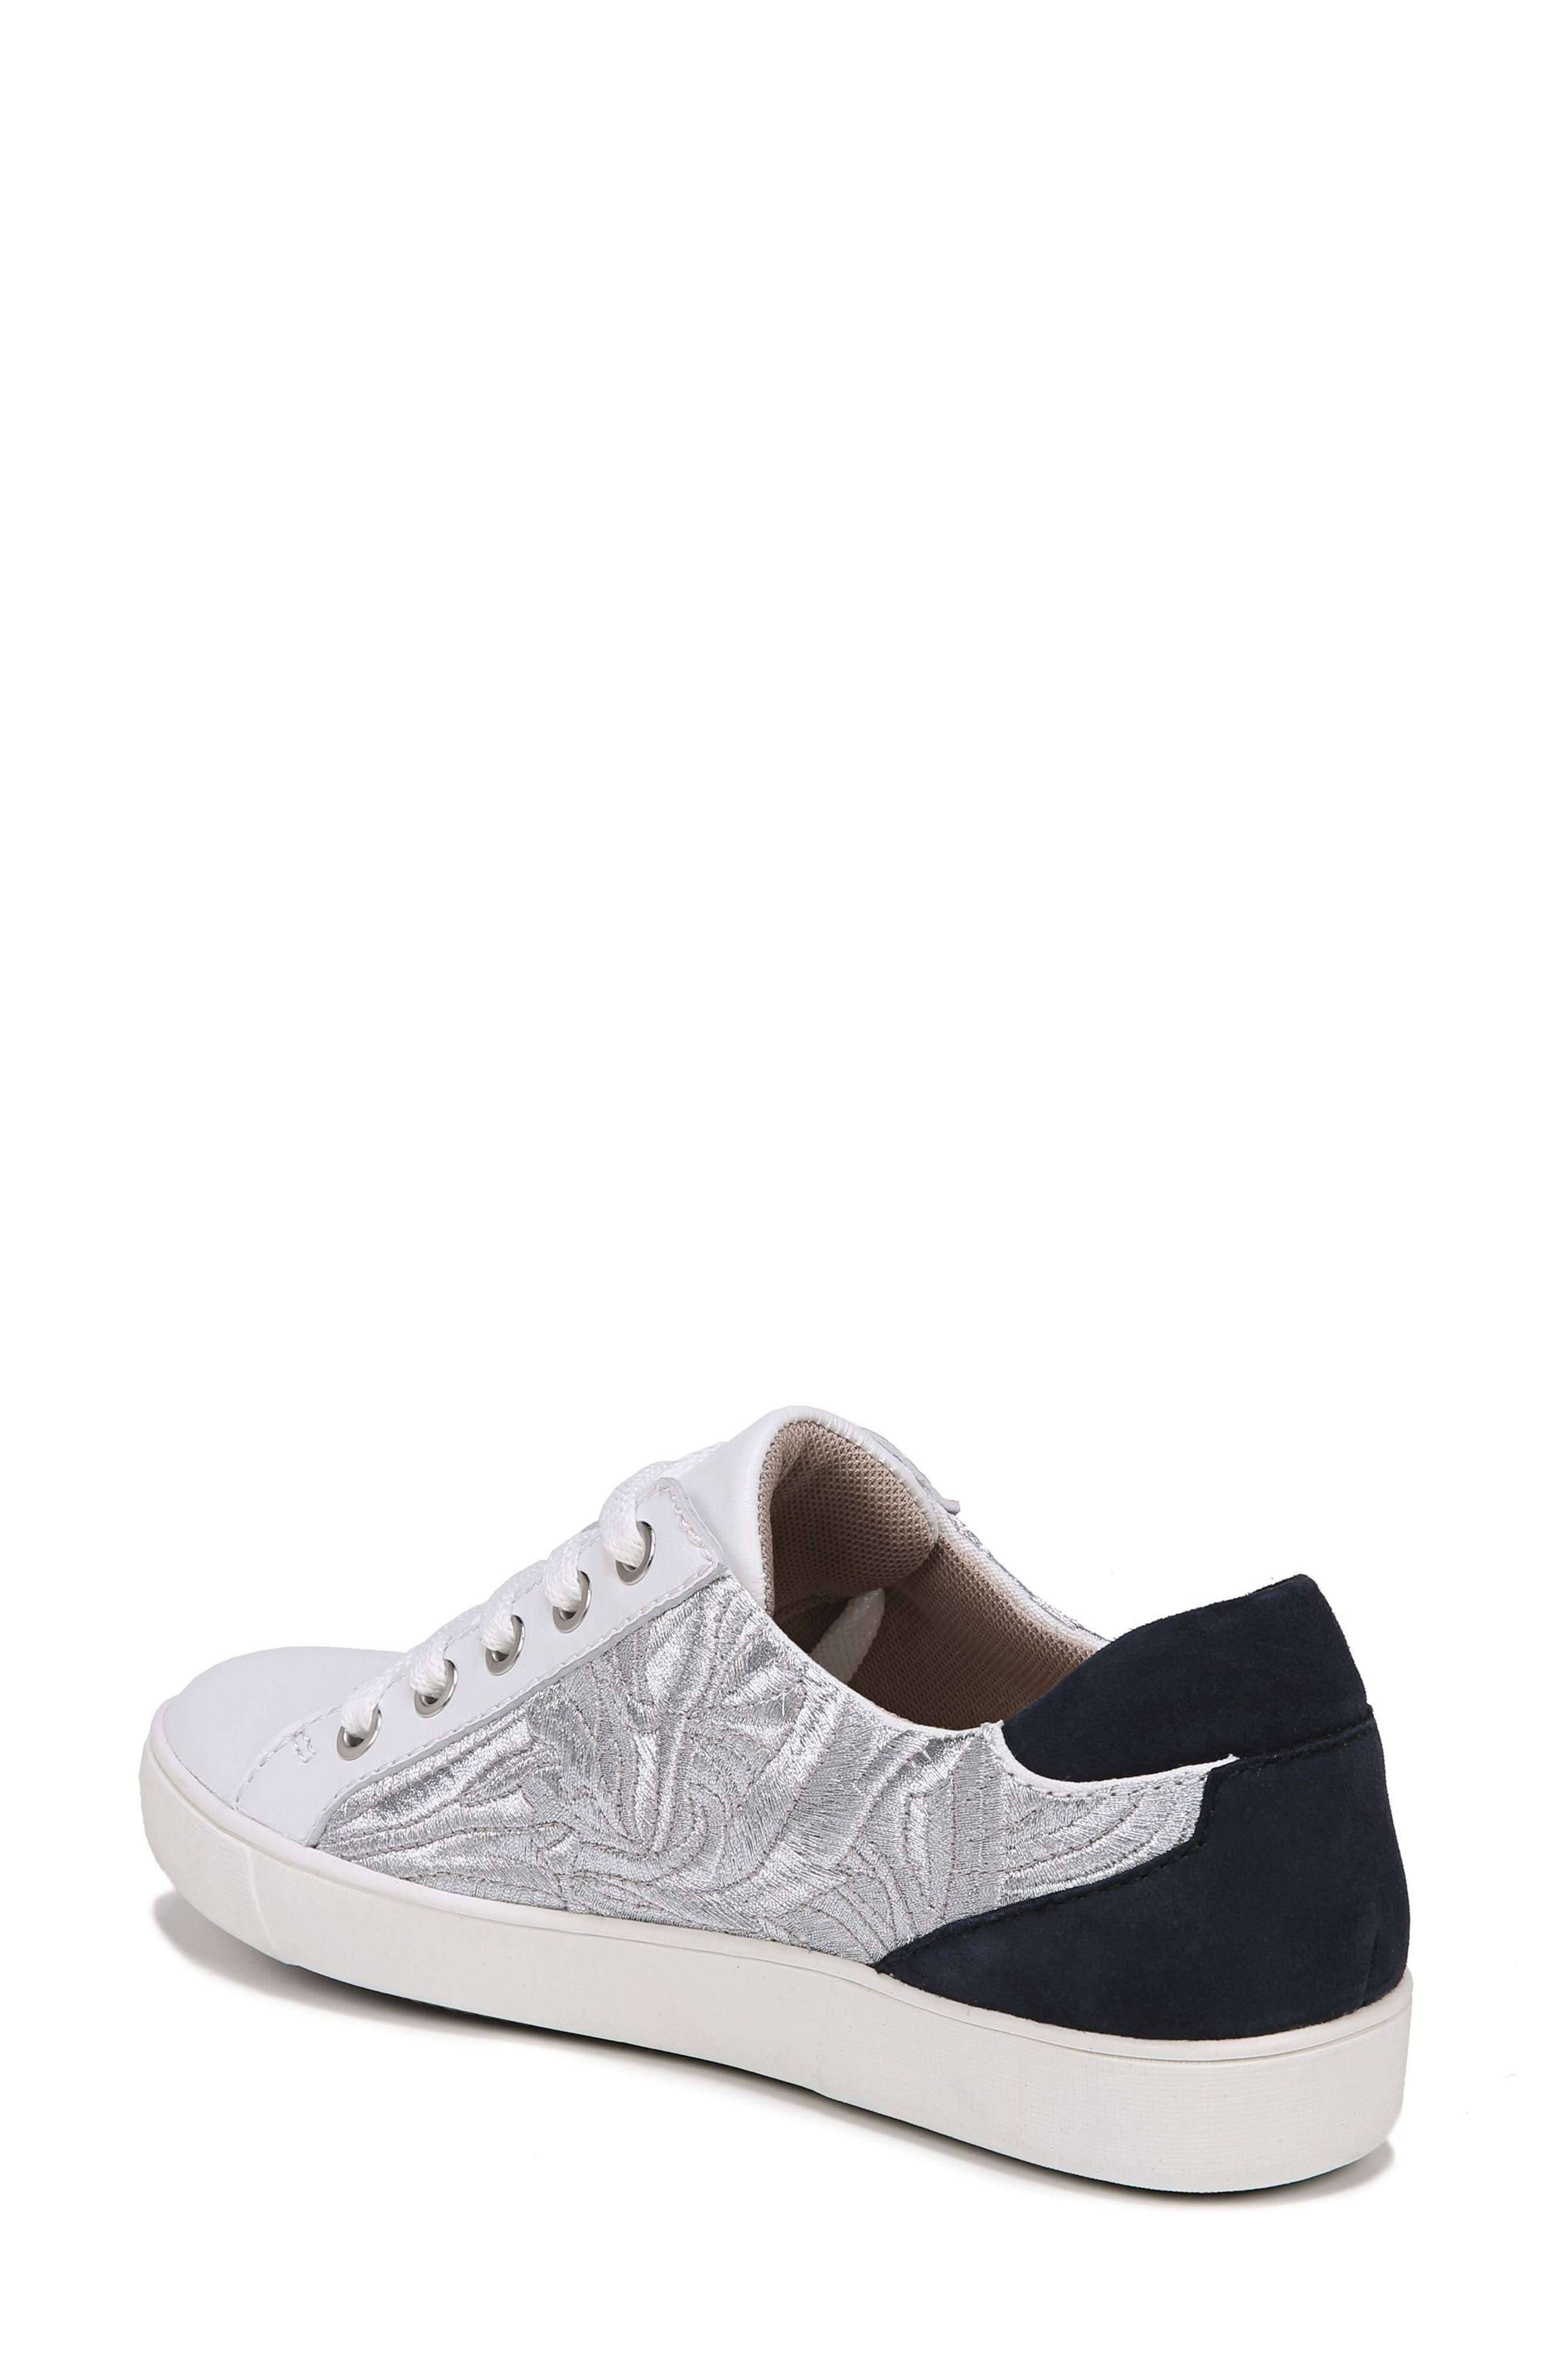 Morrison Sneaker,                             Alternate thumbnail 2, color,                             White/ Silver Leather